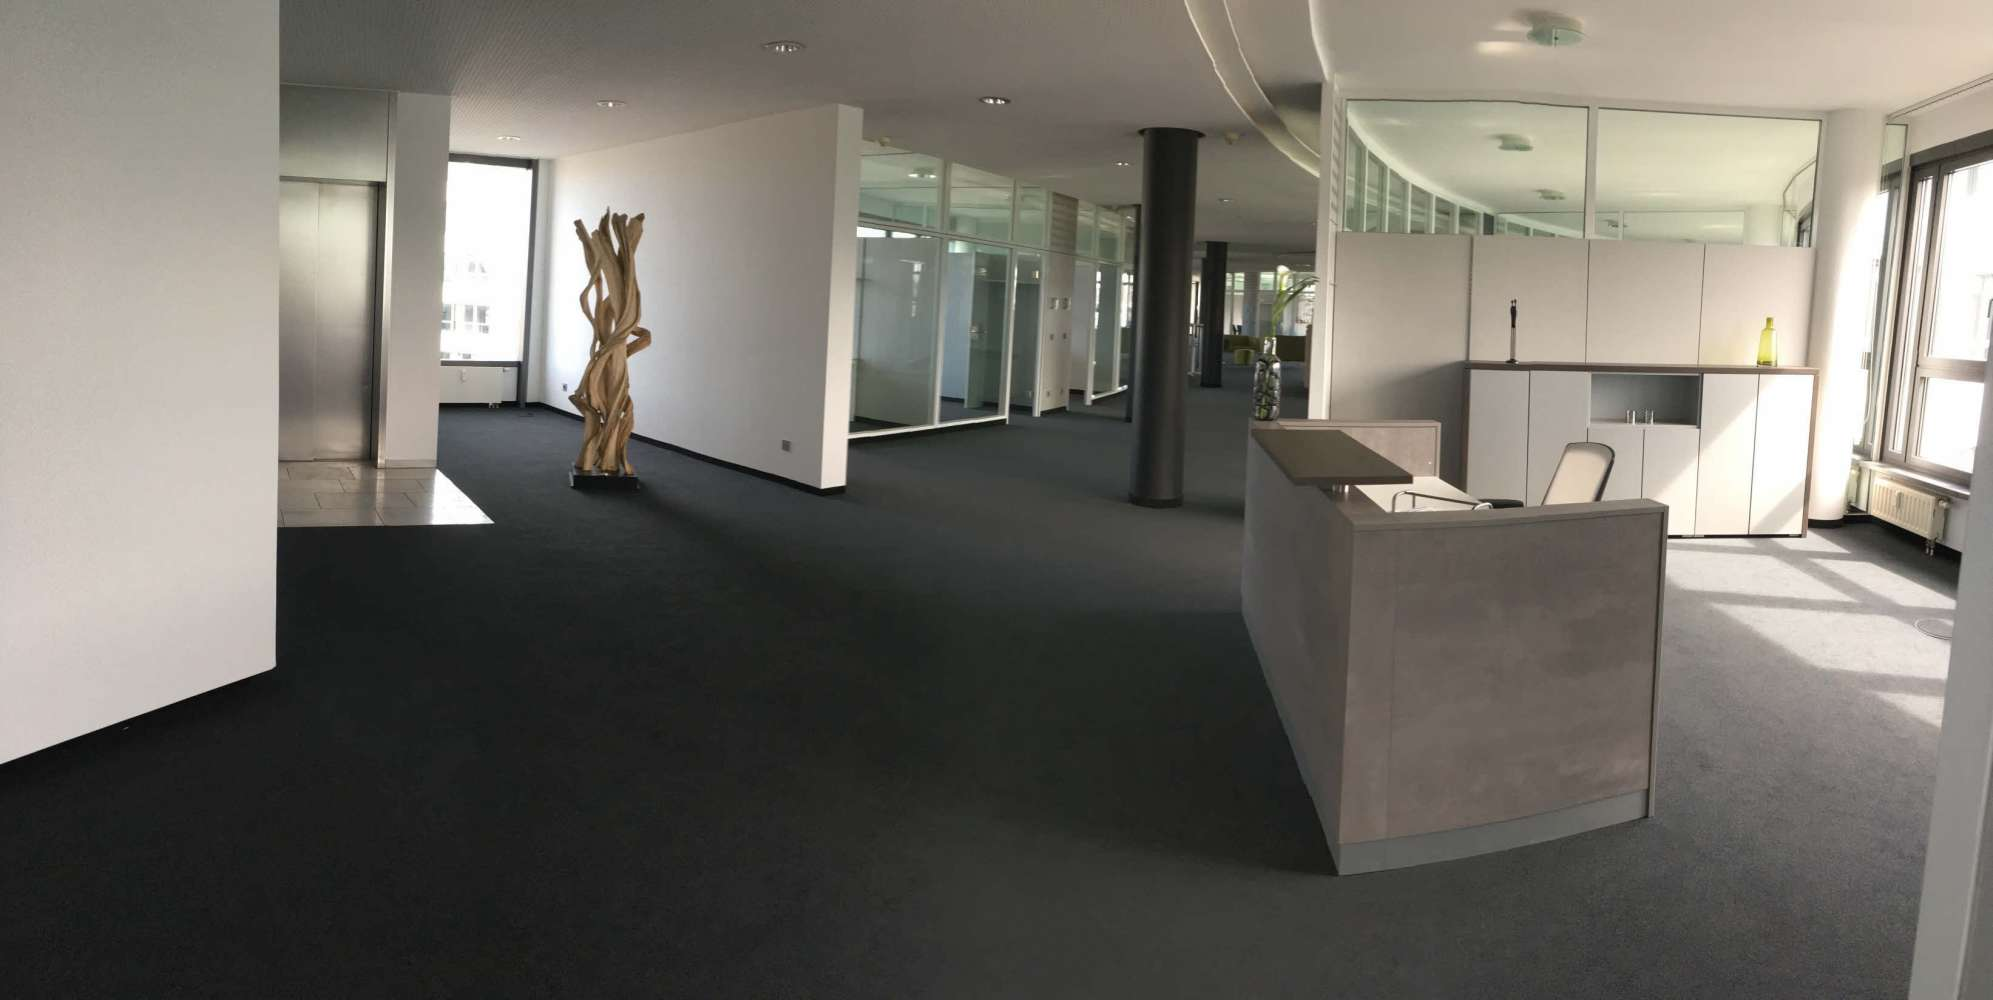 Büros Augsburg, 86167 - Büro - Augsburg, Lechhausen - M0915 - 10310691